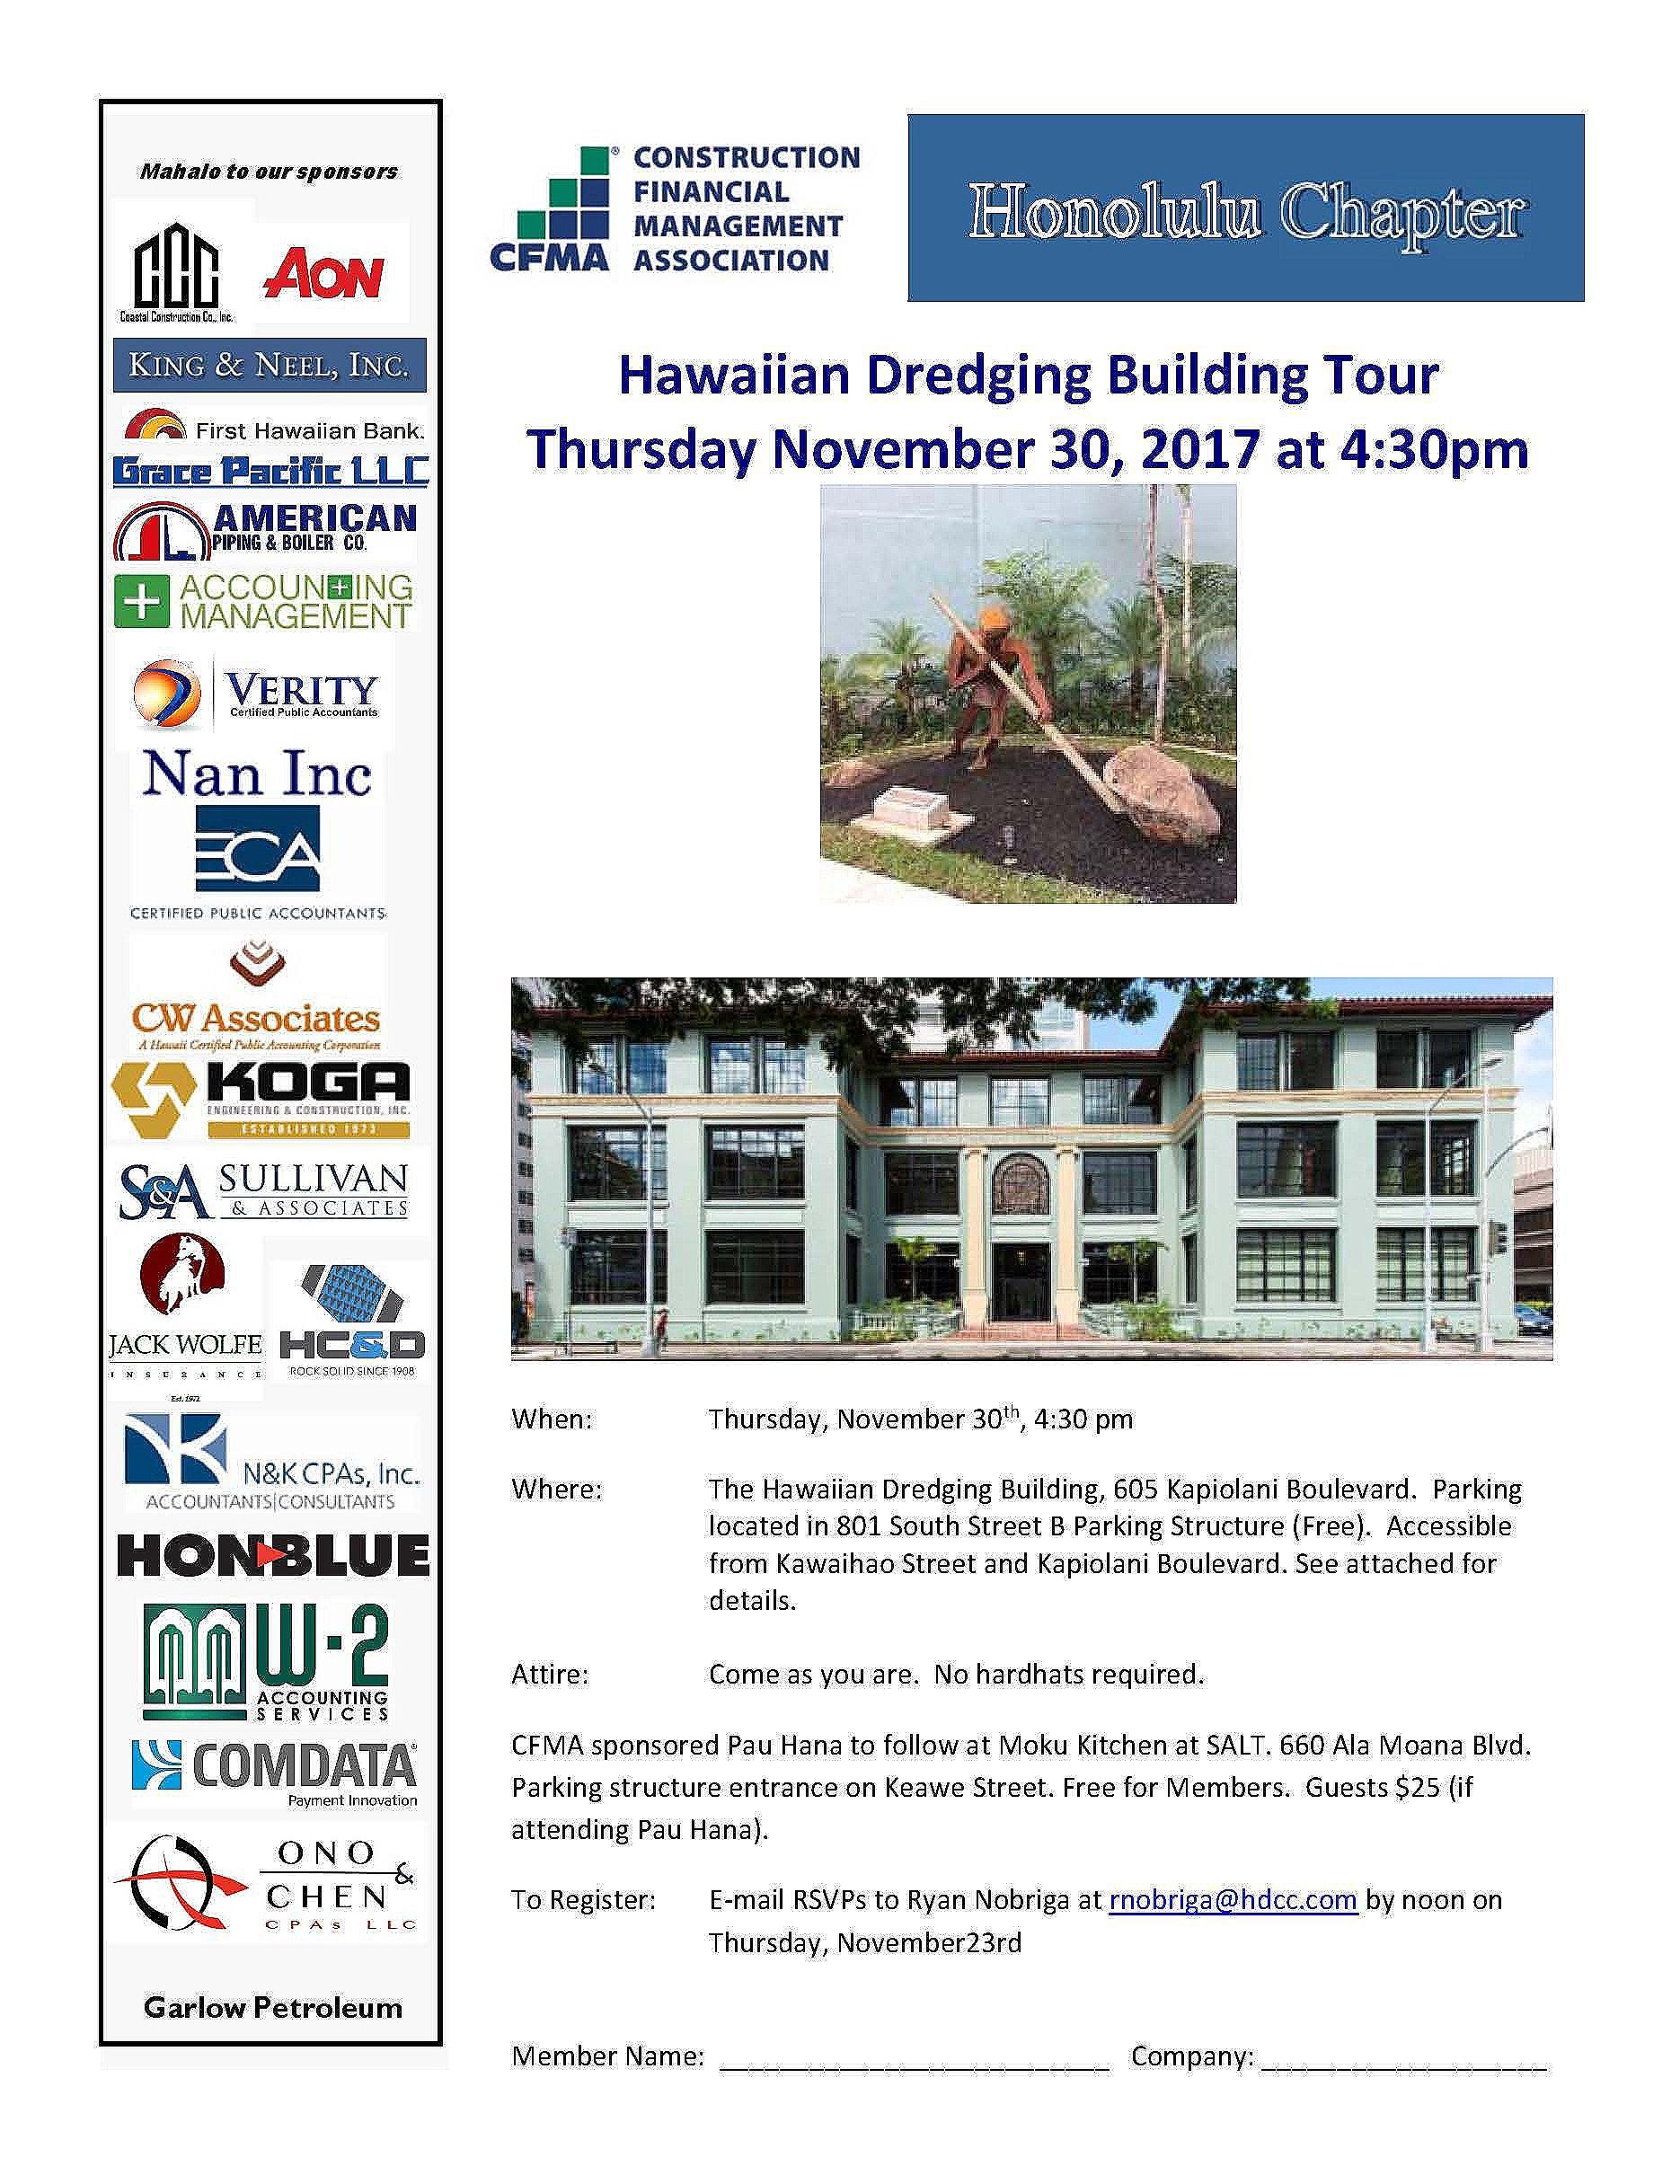 Hawaiian Dredging Building Tour - Honolulu